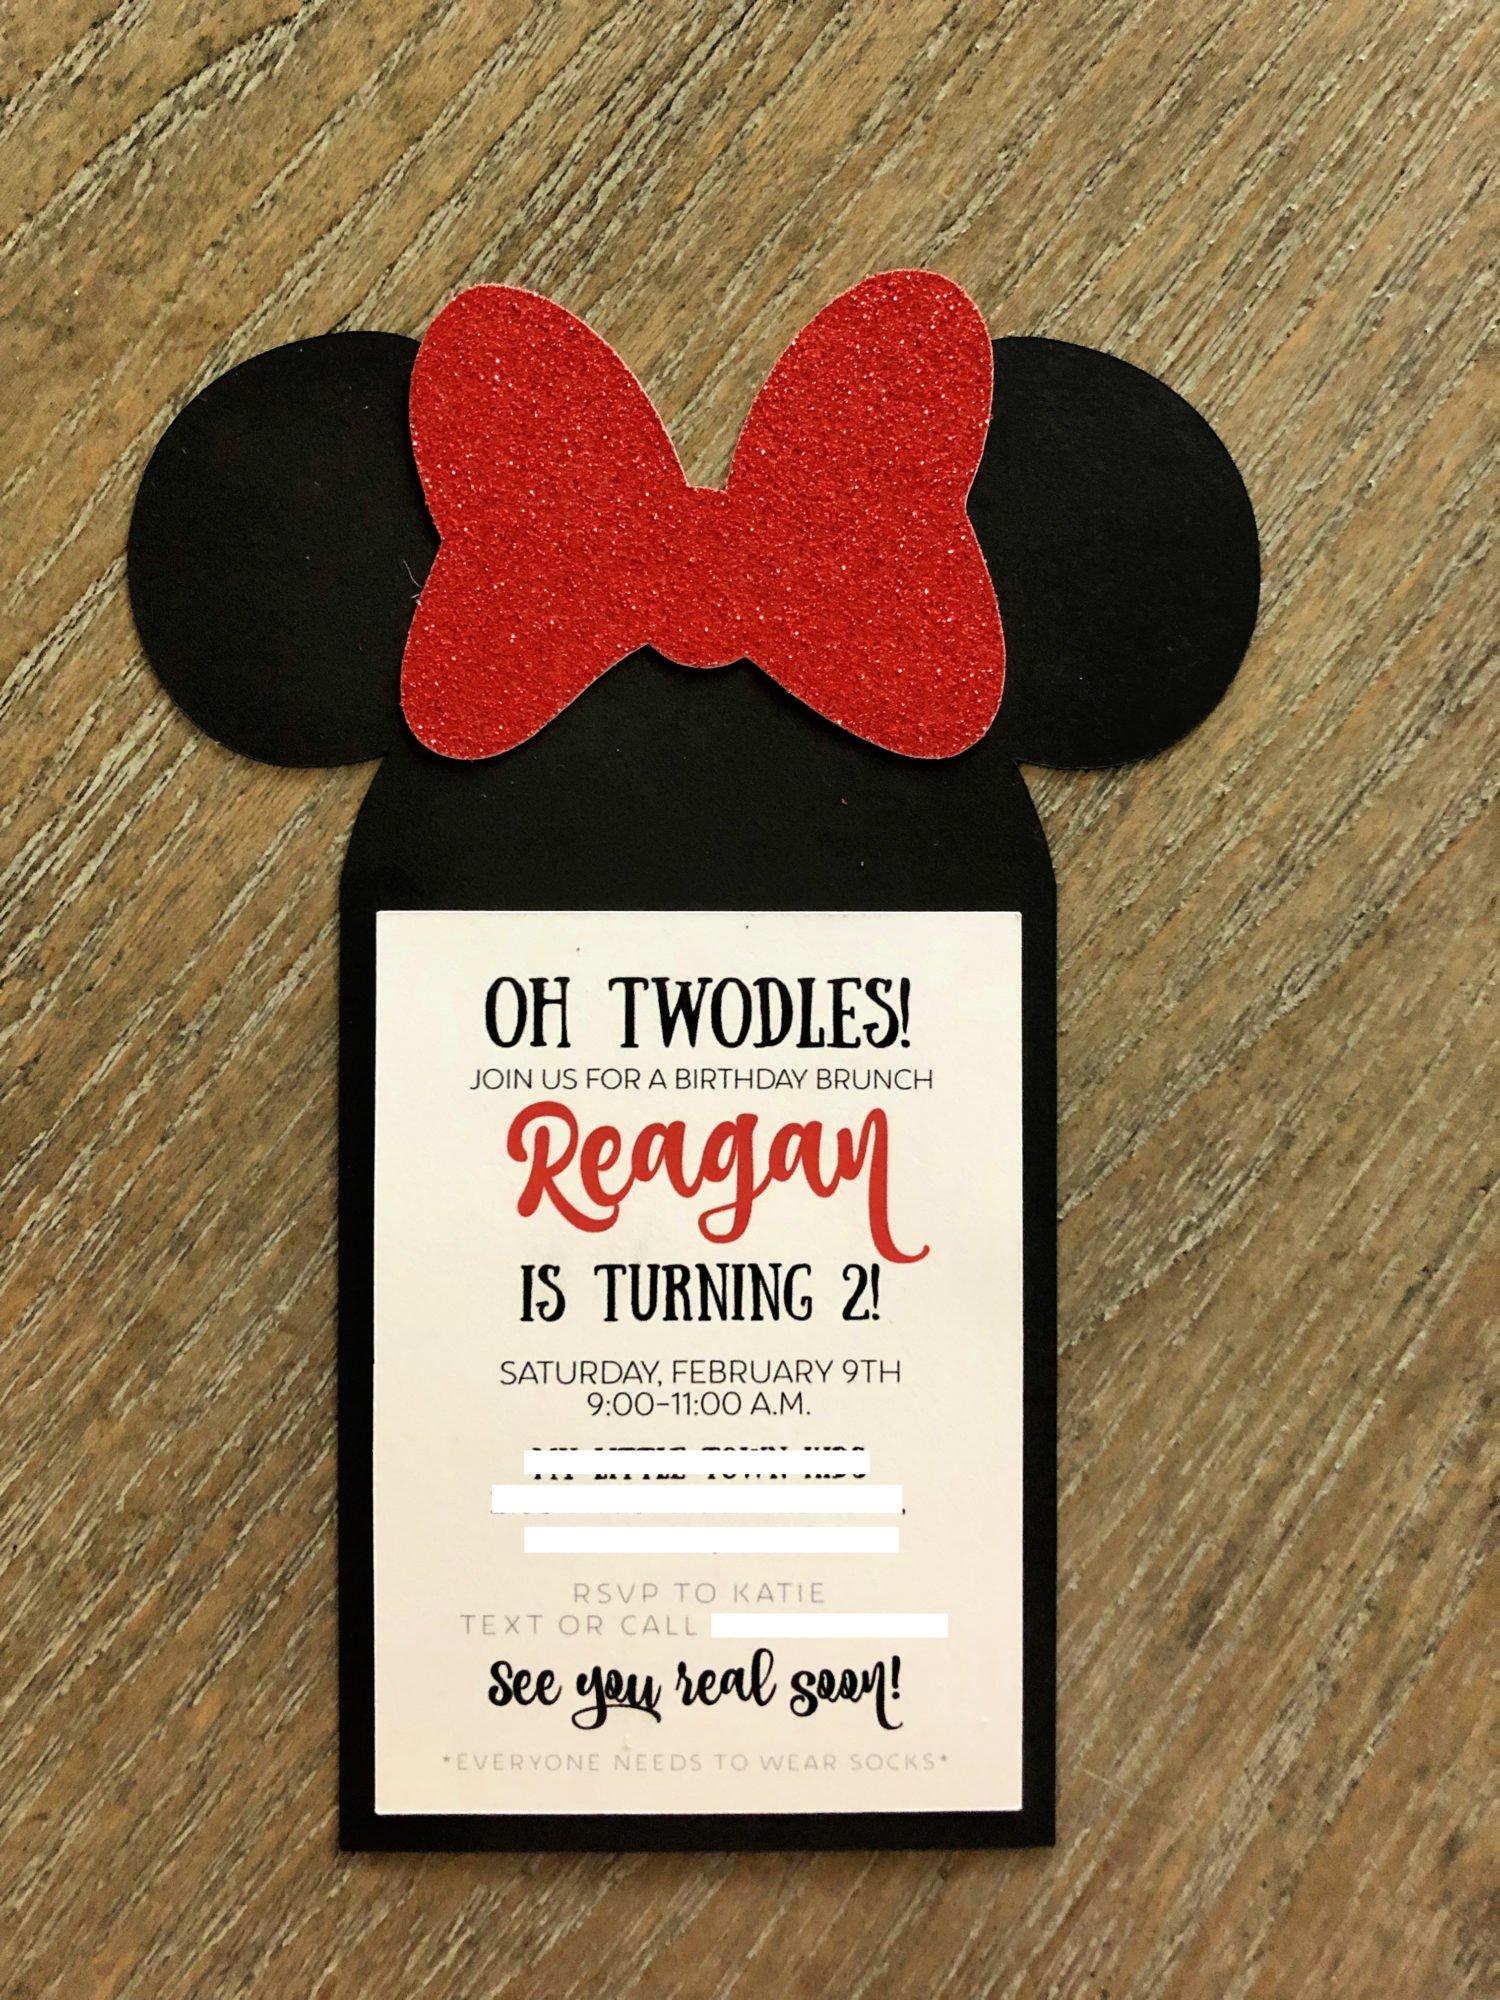 Diy Minnie Mouse Birthday Party Ideas Sew Woodsy